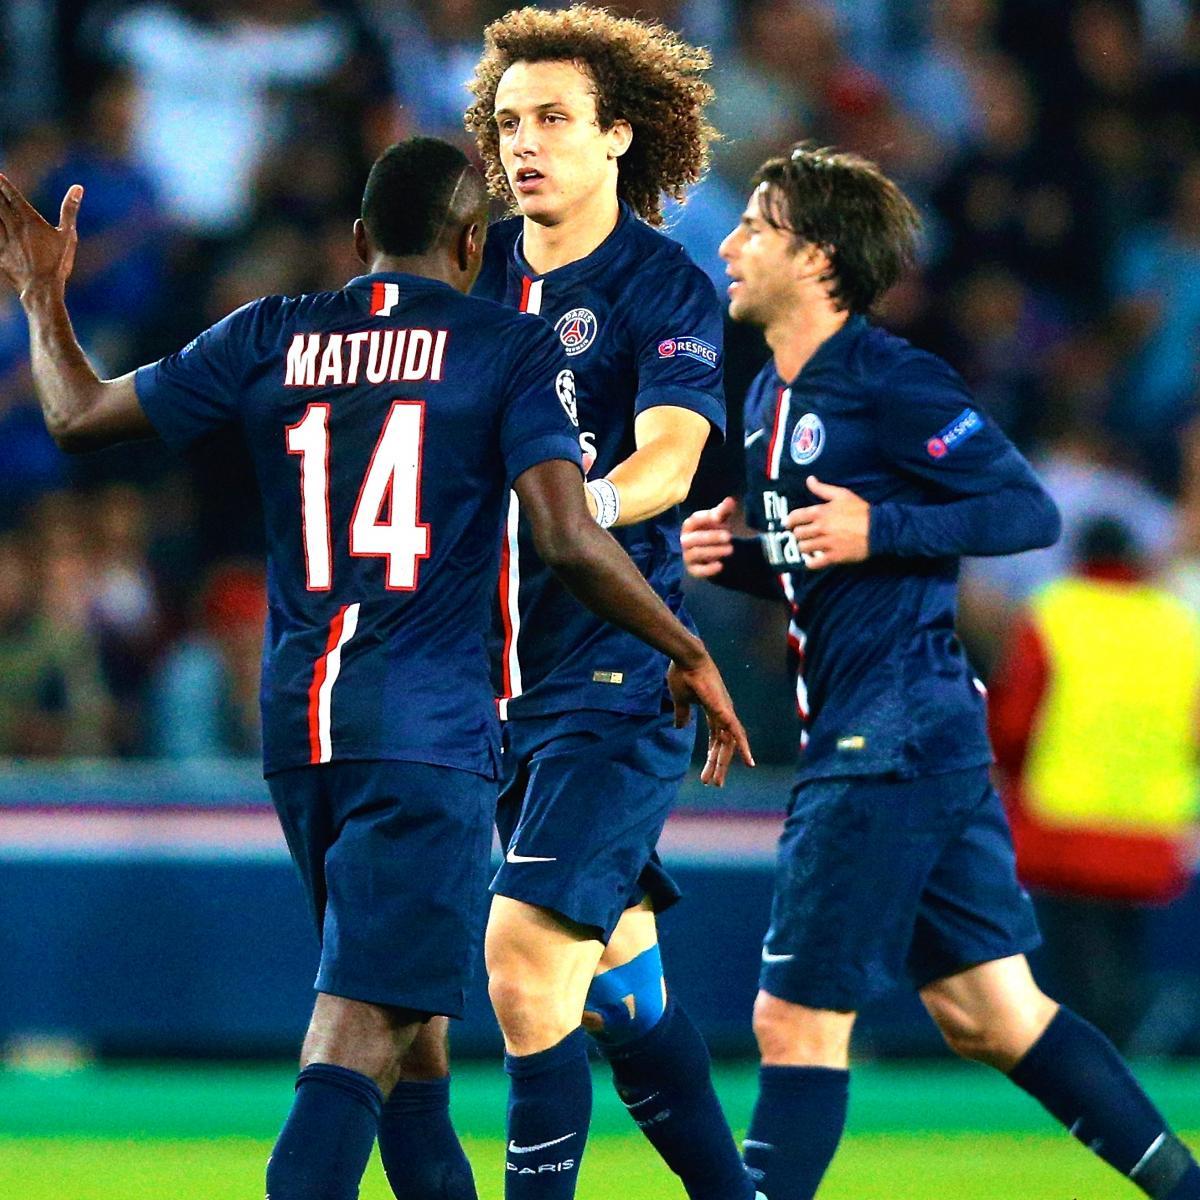 Bastia 0 3 Psg Match Report: PSG Vs. Barcelona: Score, Grades And Post-Match Reaction